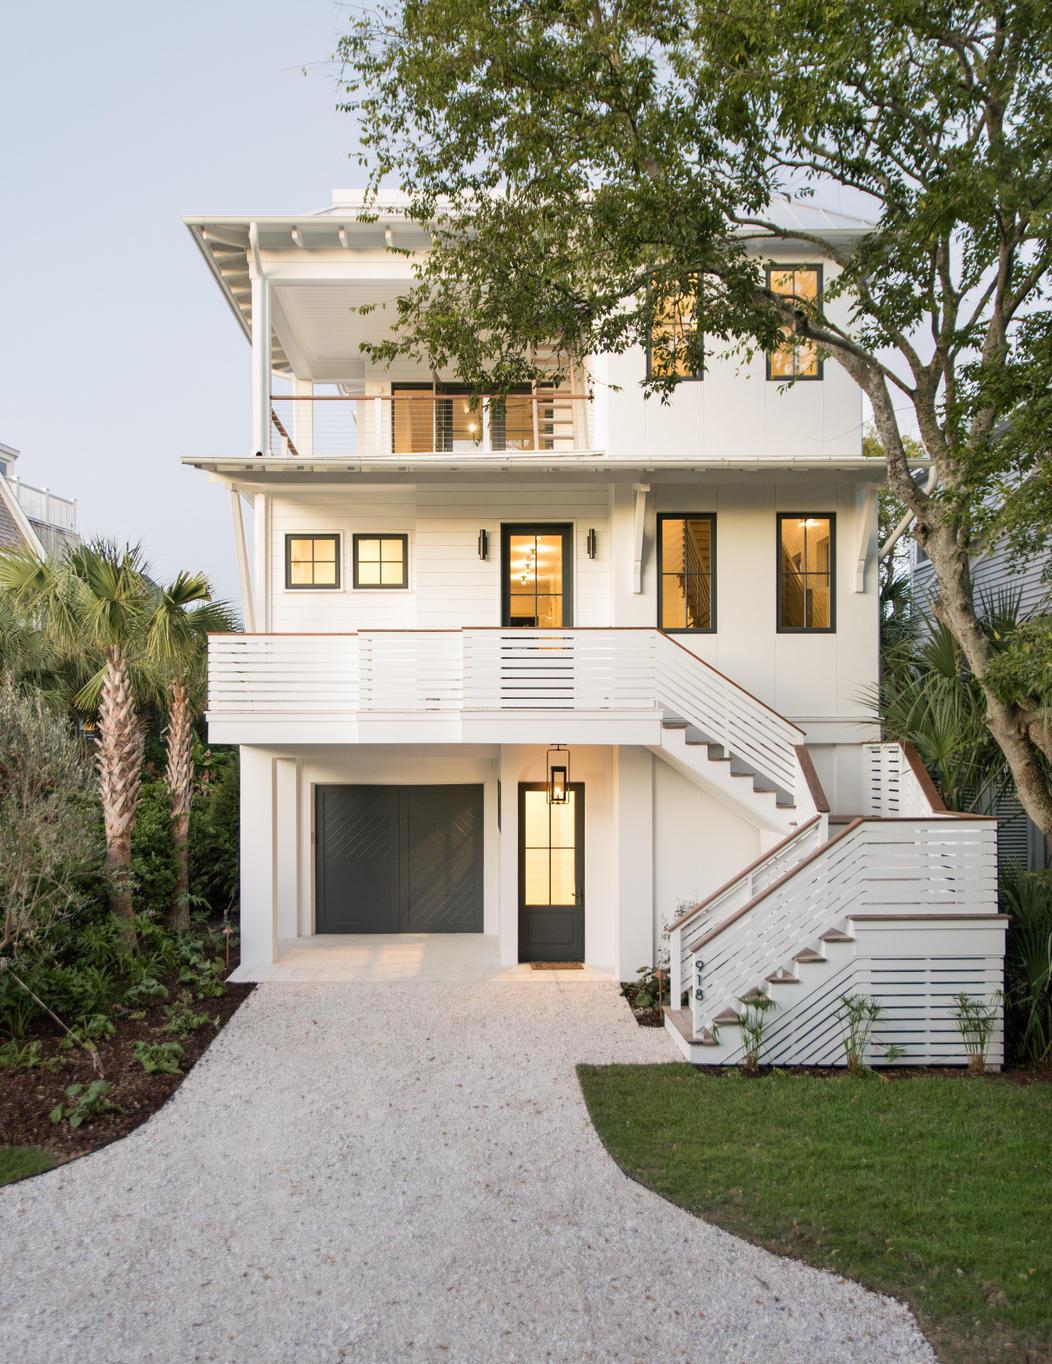 Sullivans Island Homes For Sale - 918 Middle, Sullivans Island, SC - 9